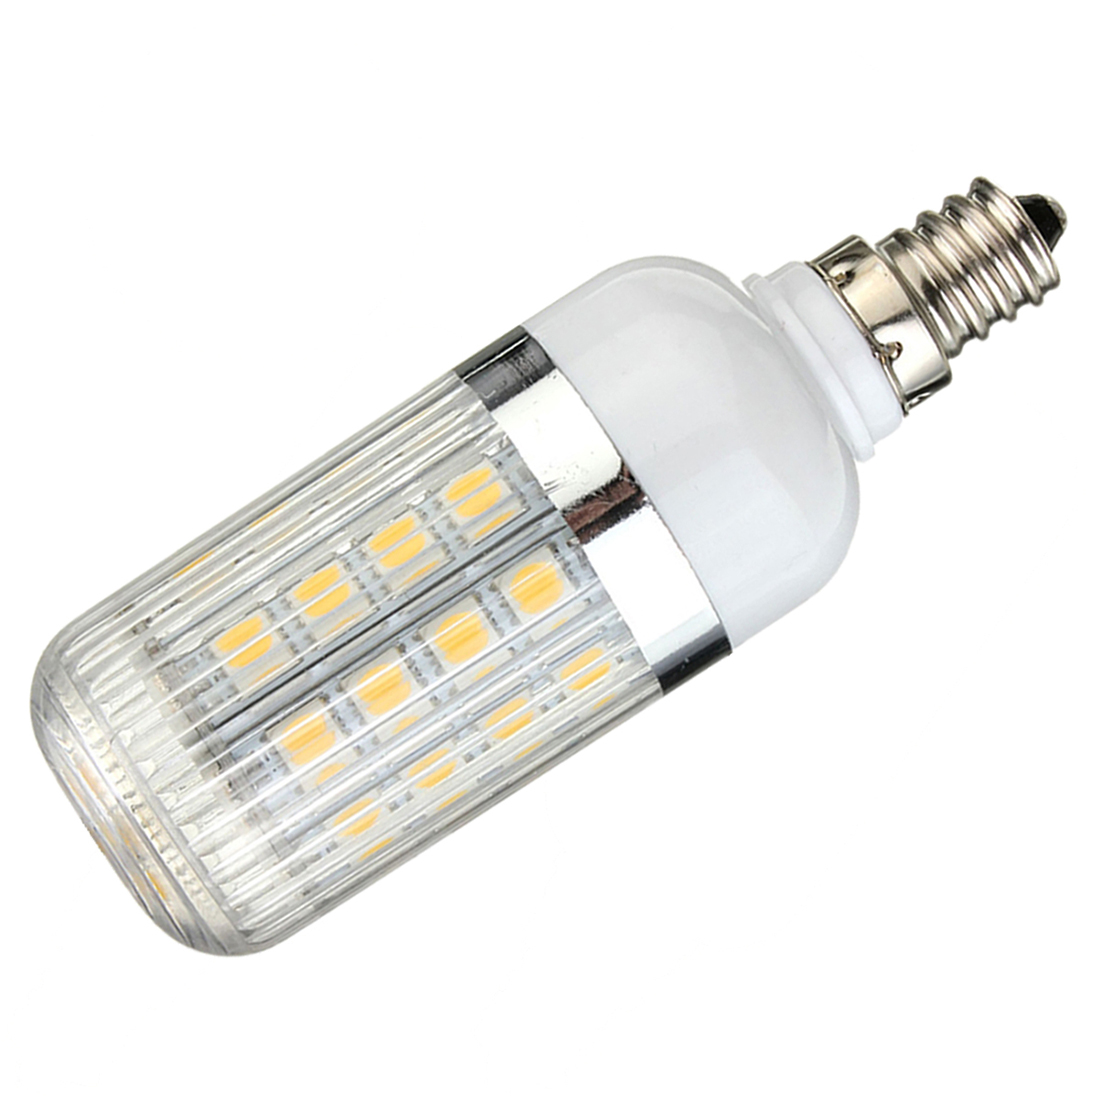 E12 5W Dimmable 36 SMD 5050 LED Corn Light Bulb Lamp Color Temperature:Warm White(3000-3500K) Amount:10 Pcs g9 5w dimmable 27 smd 5050 led corn light bulb lamp color temperature pure white 6000 6500k amount 8 pcs